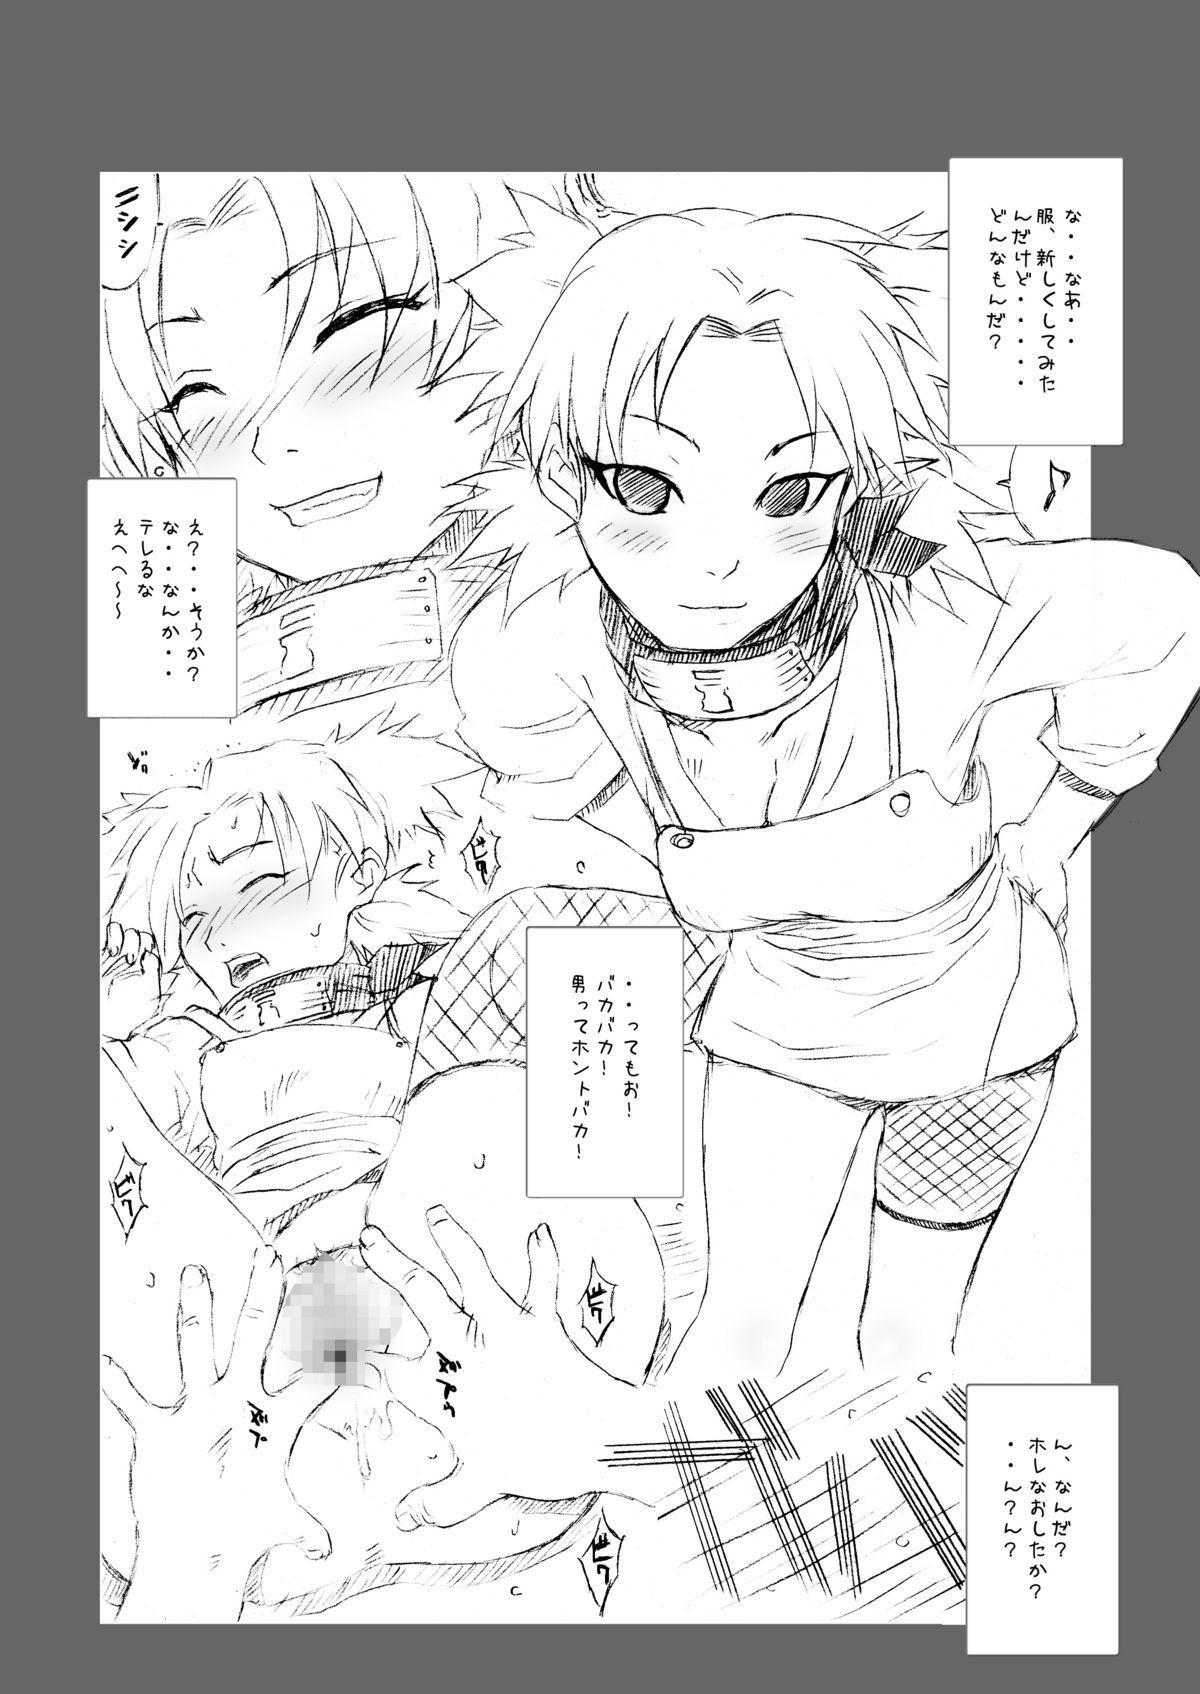 [MG WORKS (Isou Doubaku) Q.N.T DL (Naruto) [Digital] 63